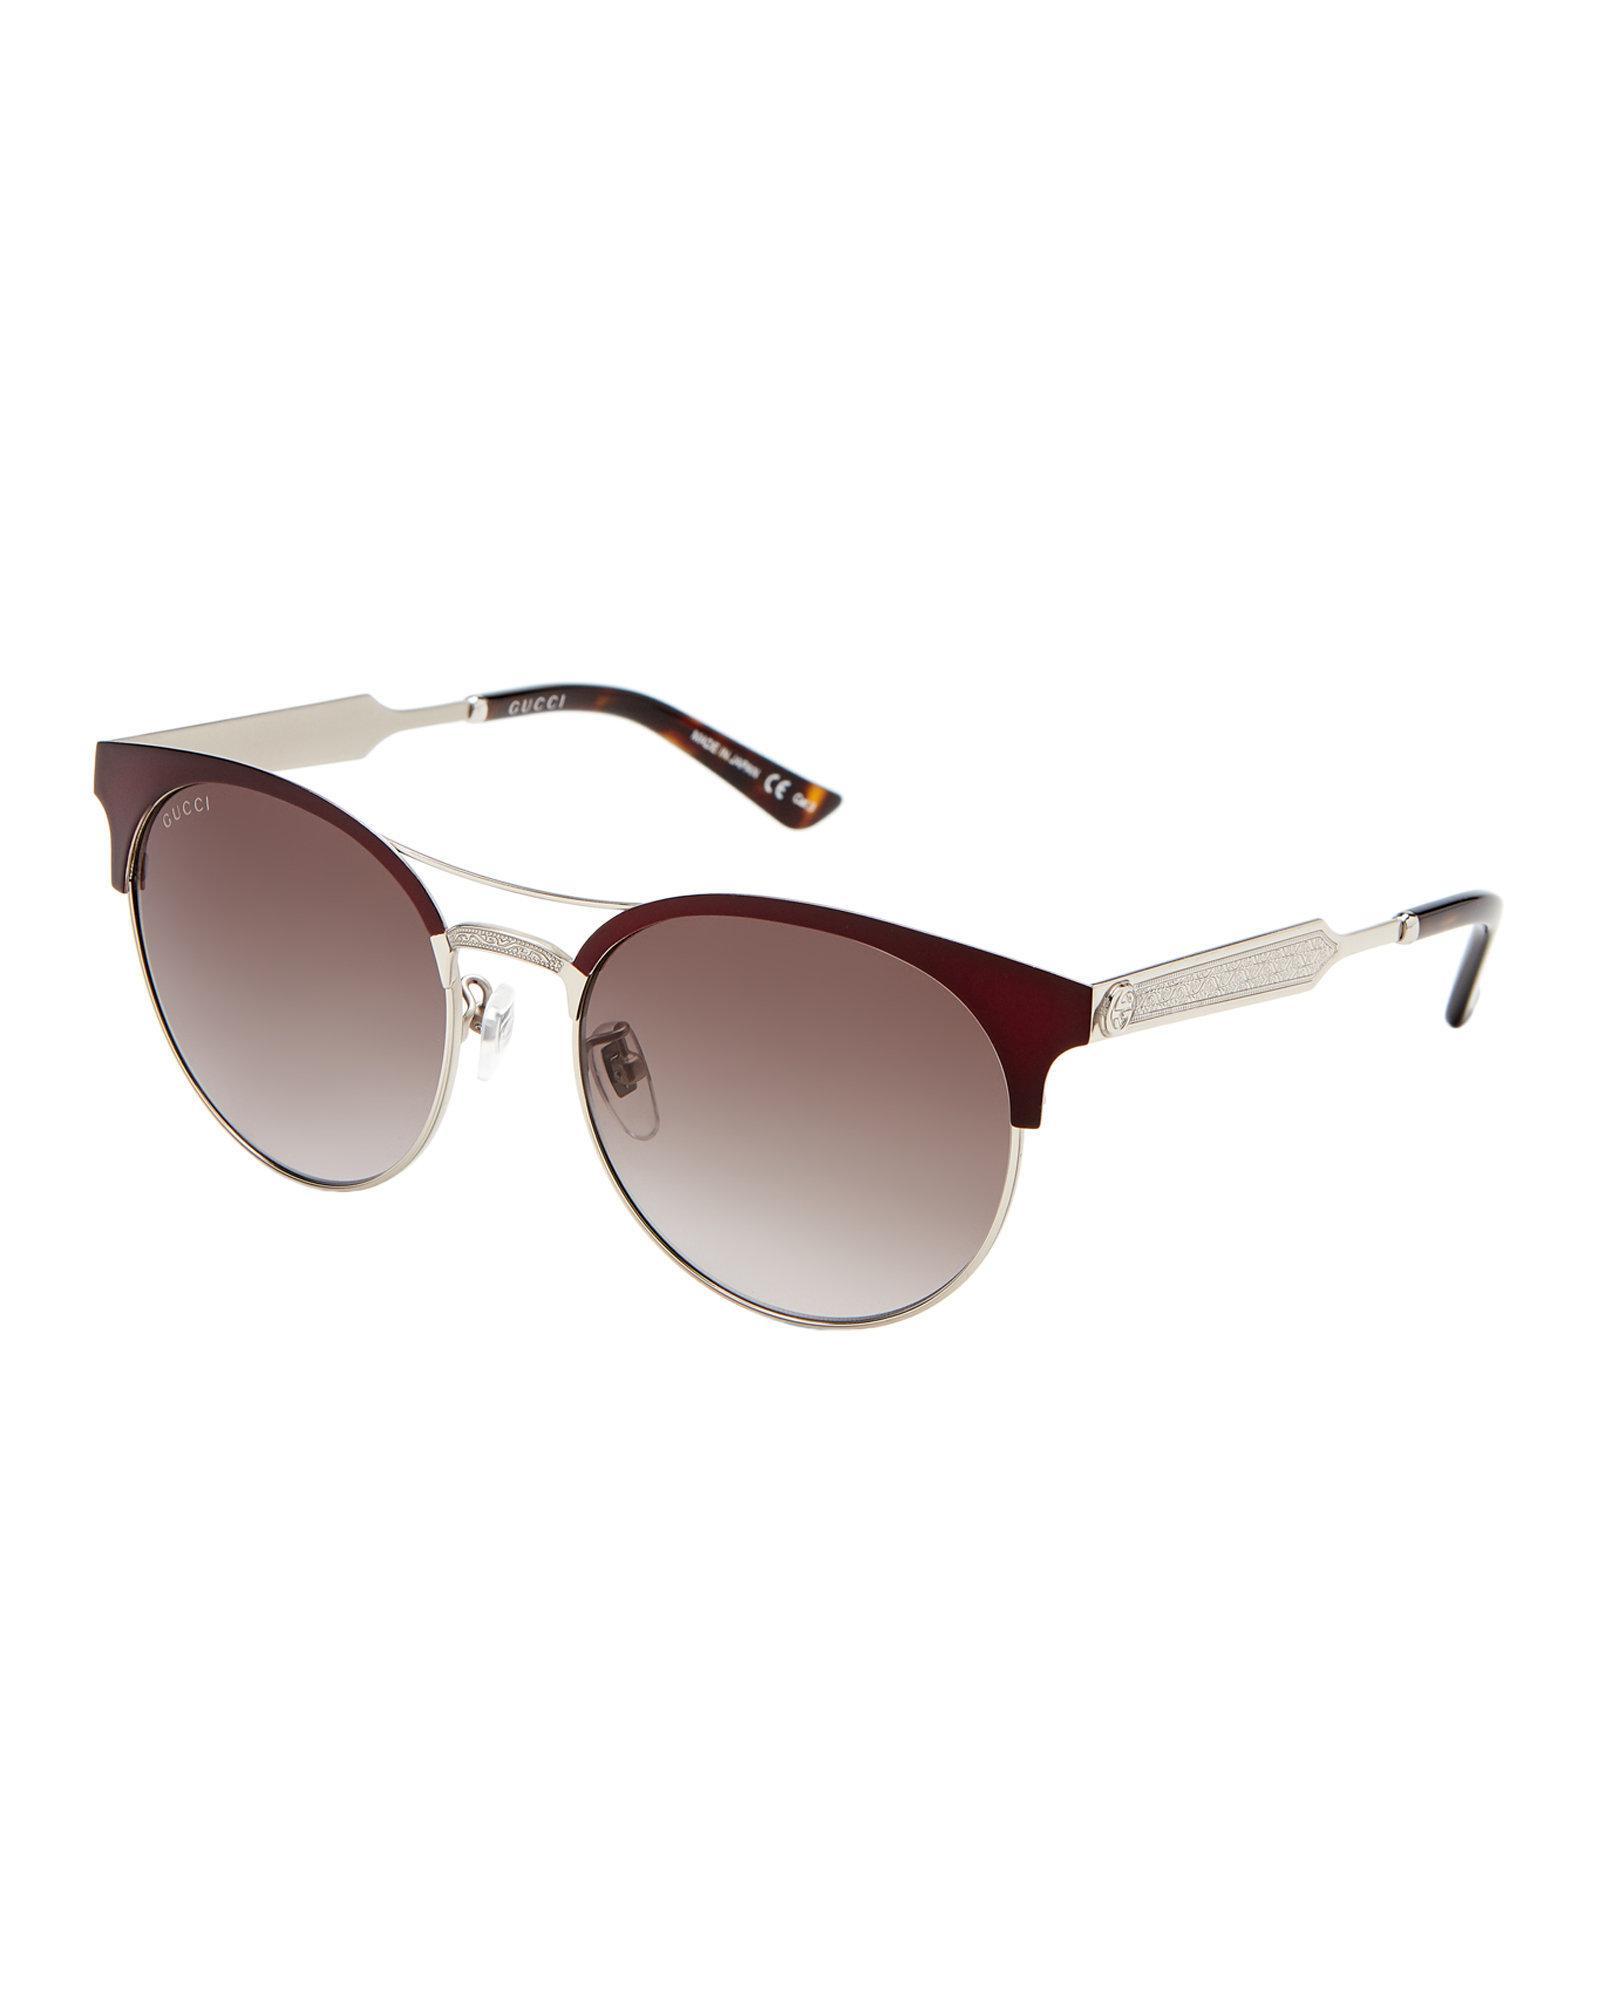 ccf7d9fda2409 Gucci Gg 0075 s Burgundy Round Sunglasses in Brown - Lyst